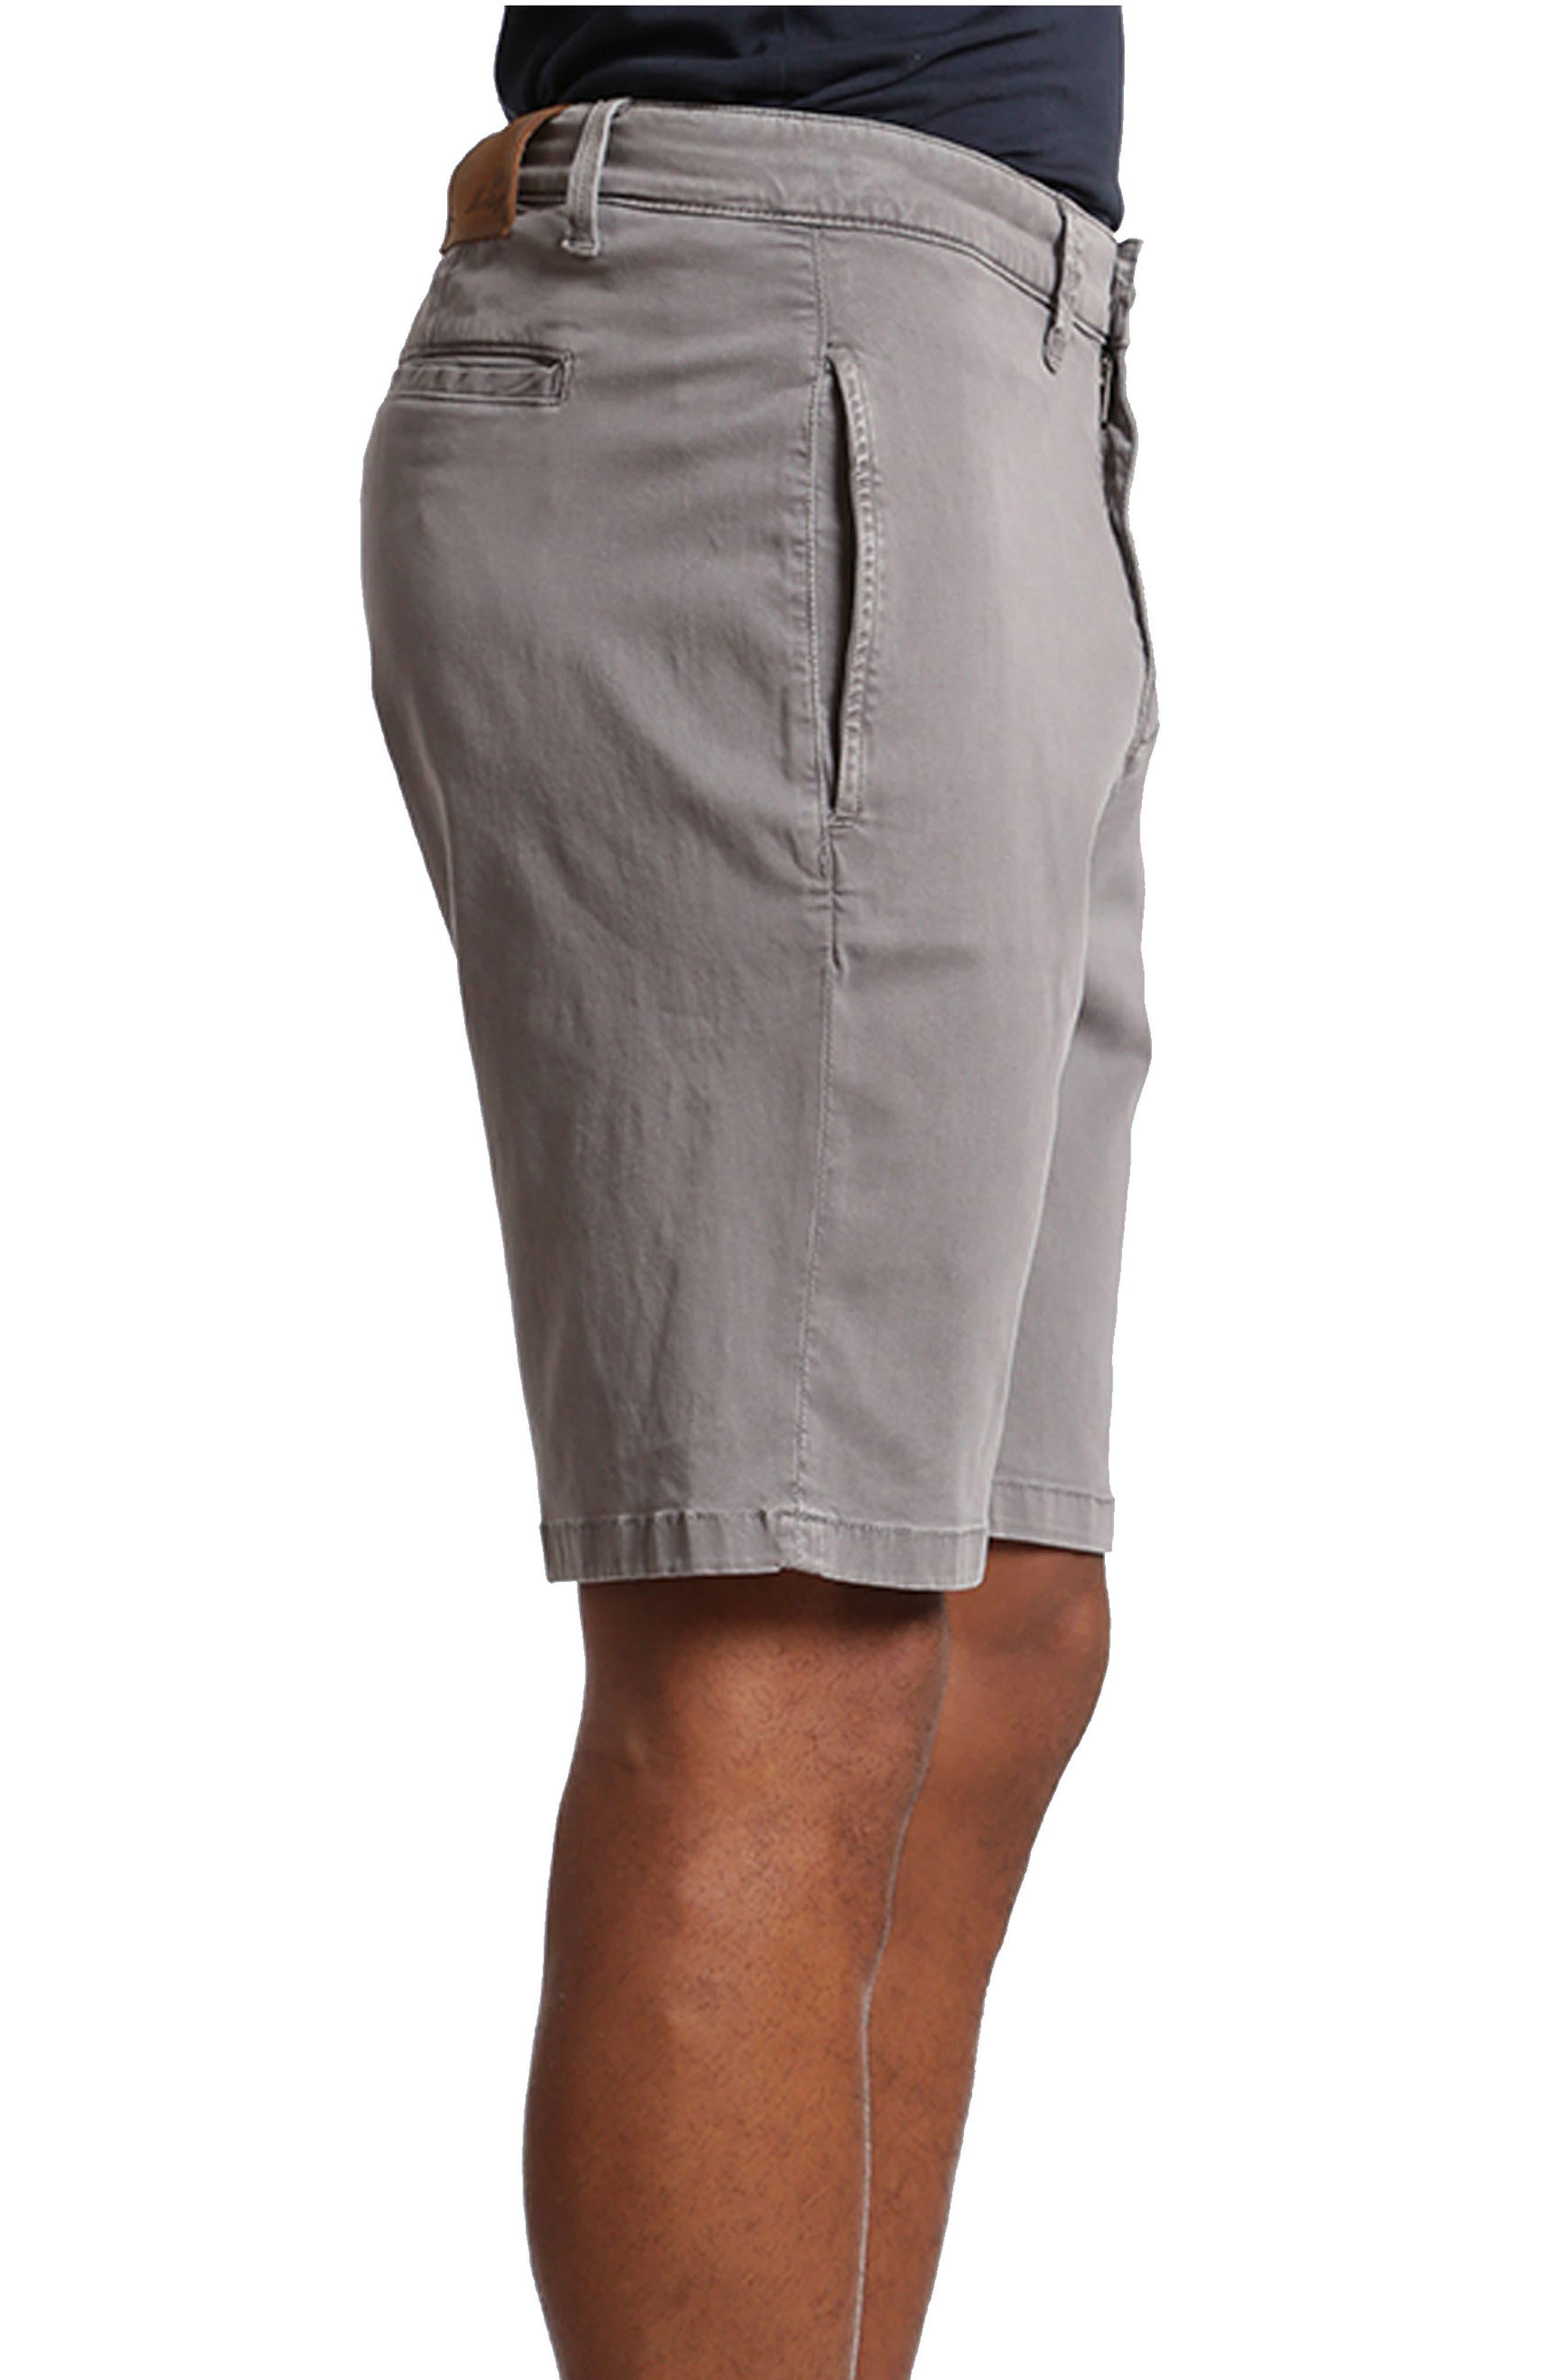 Nevada Twill Shorts,                             Alternate thumbnail 3, color,                             SHARK TWILL